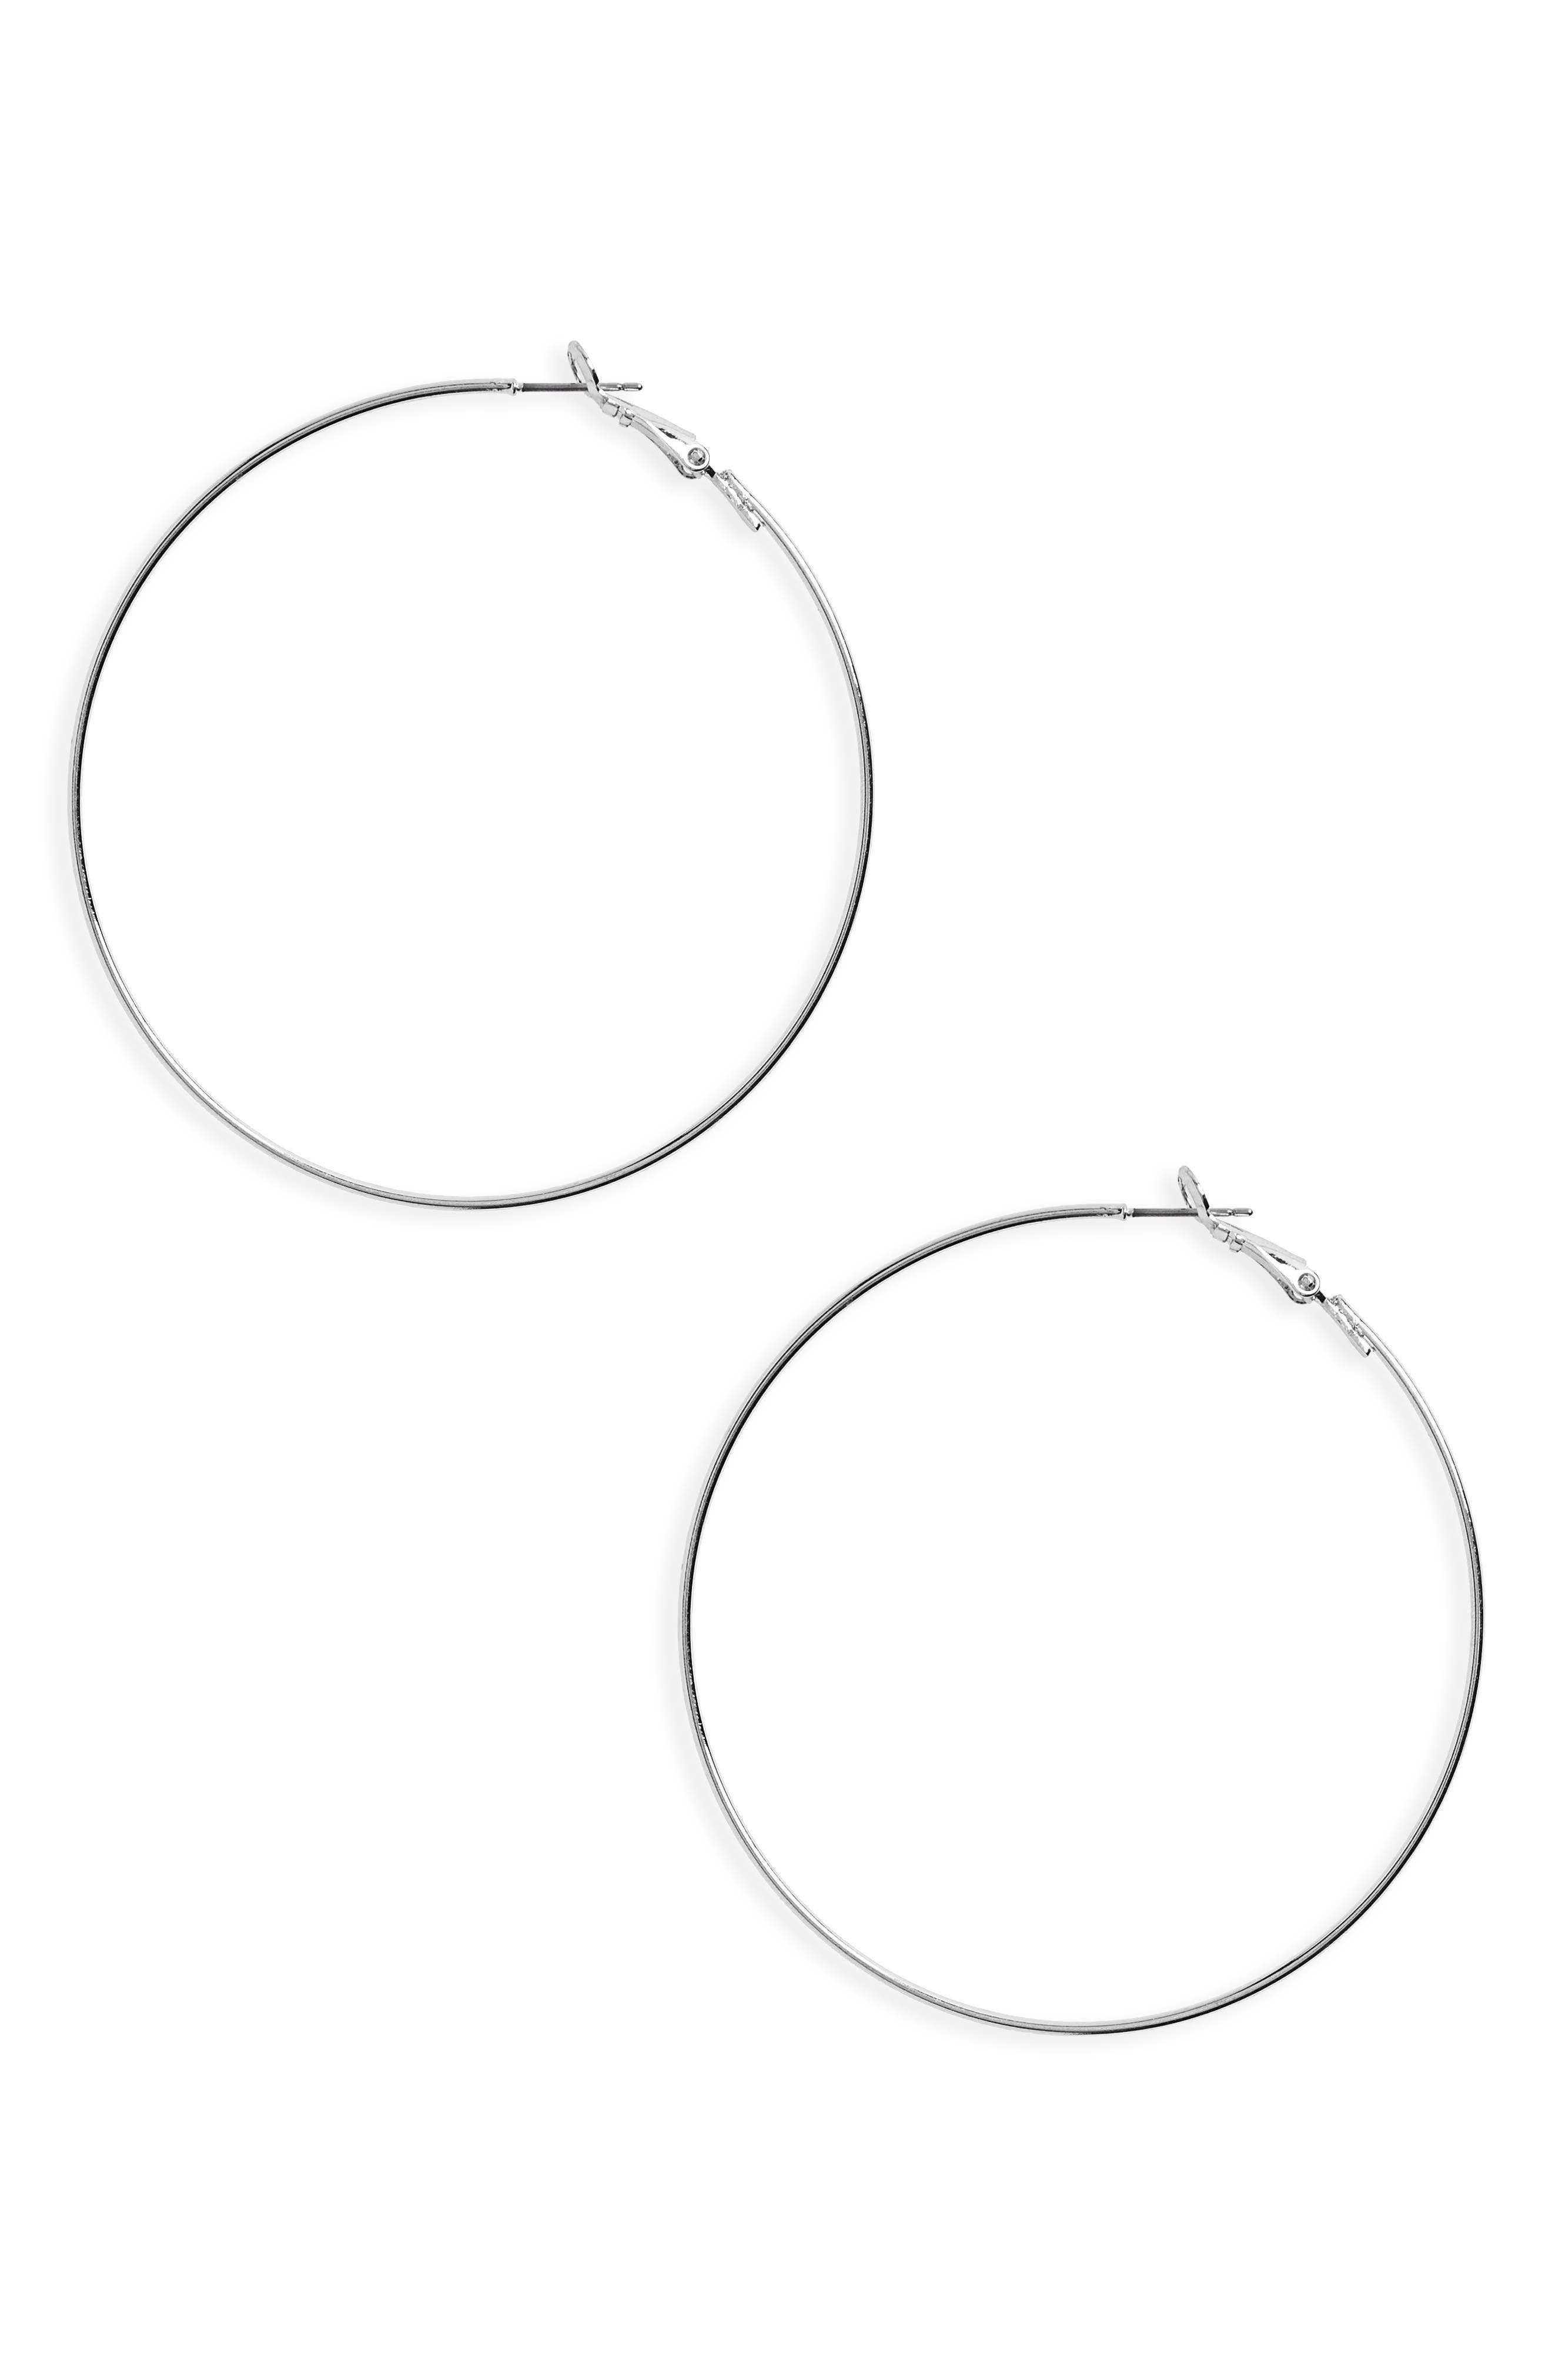 Hoop Earrings,                             Main thumbnail 1, color,                             Silver